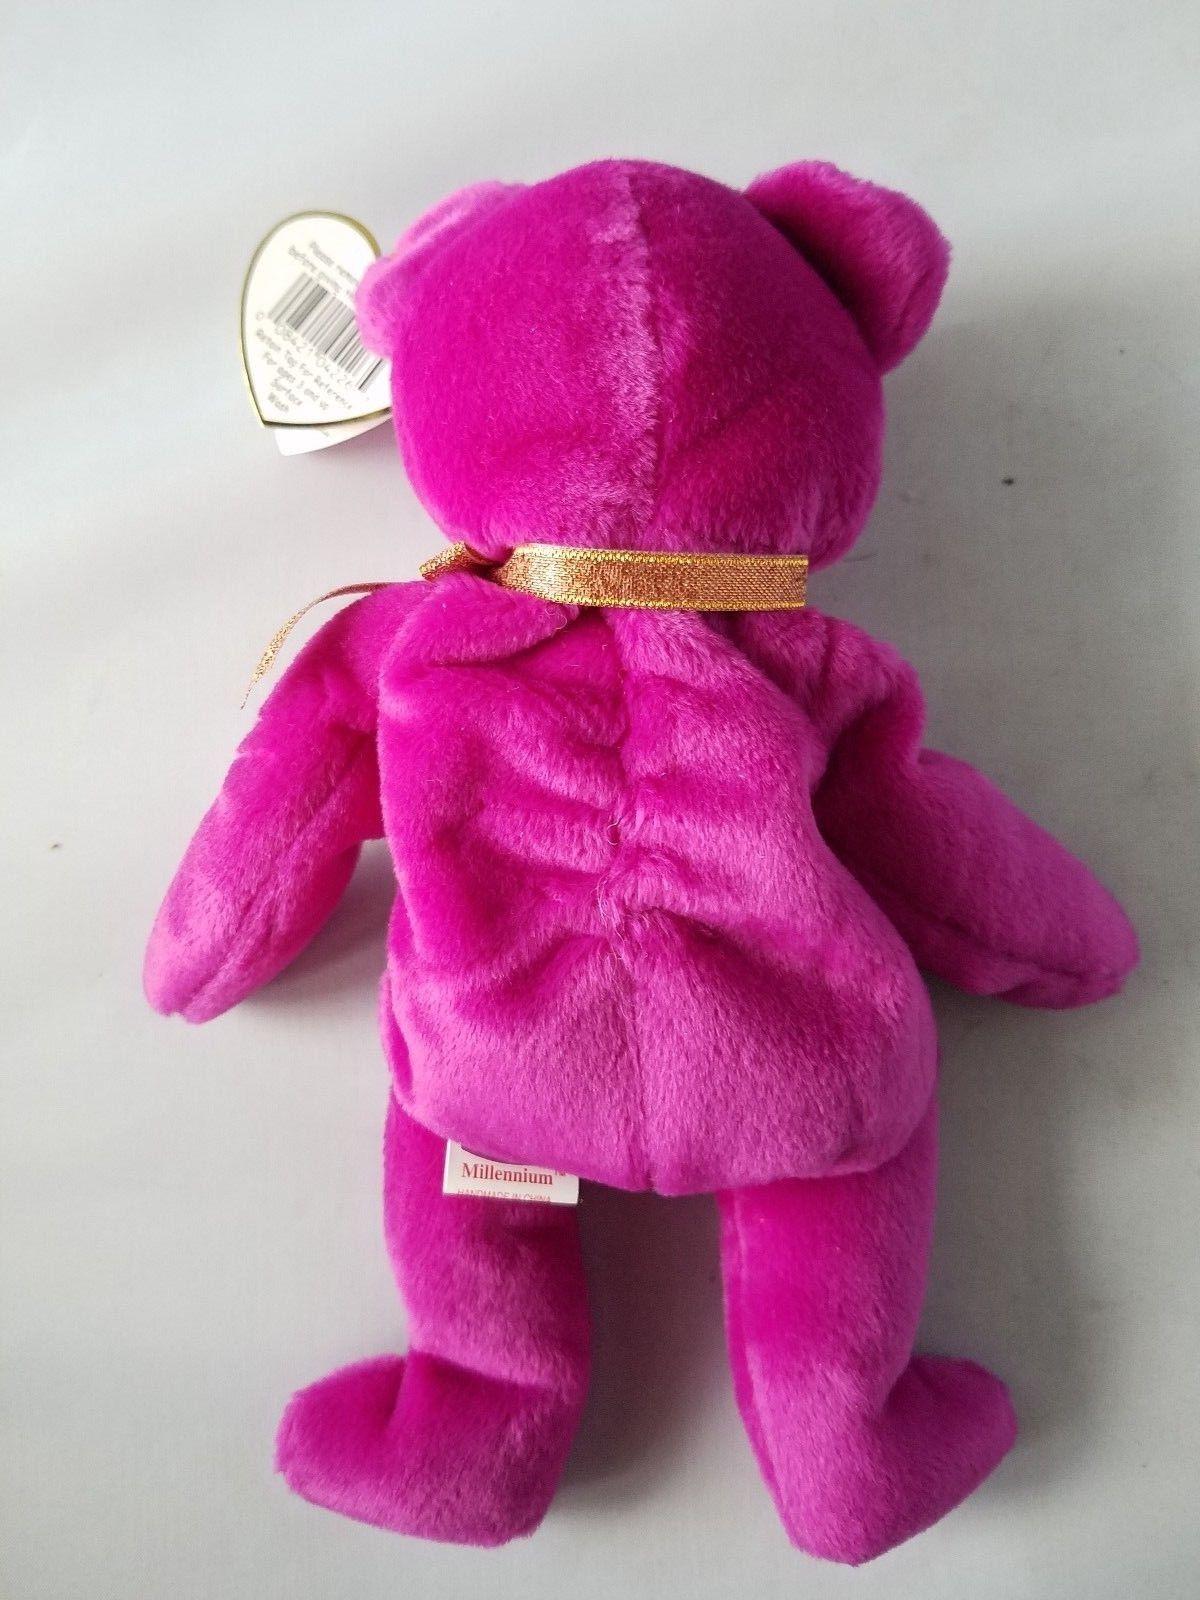 2a903b1773d Ty Beanie Baby Millennium Millenium Bear P.E. Pellets Rare With Errors .